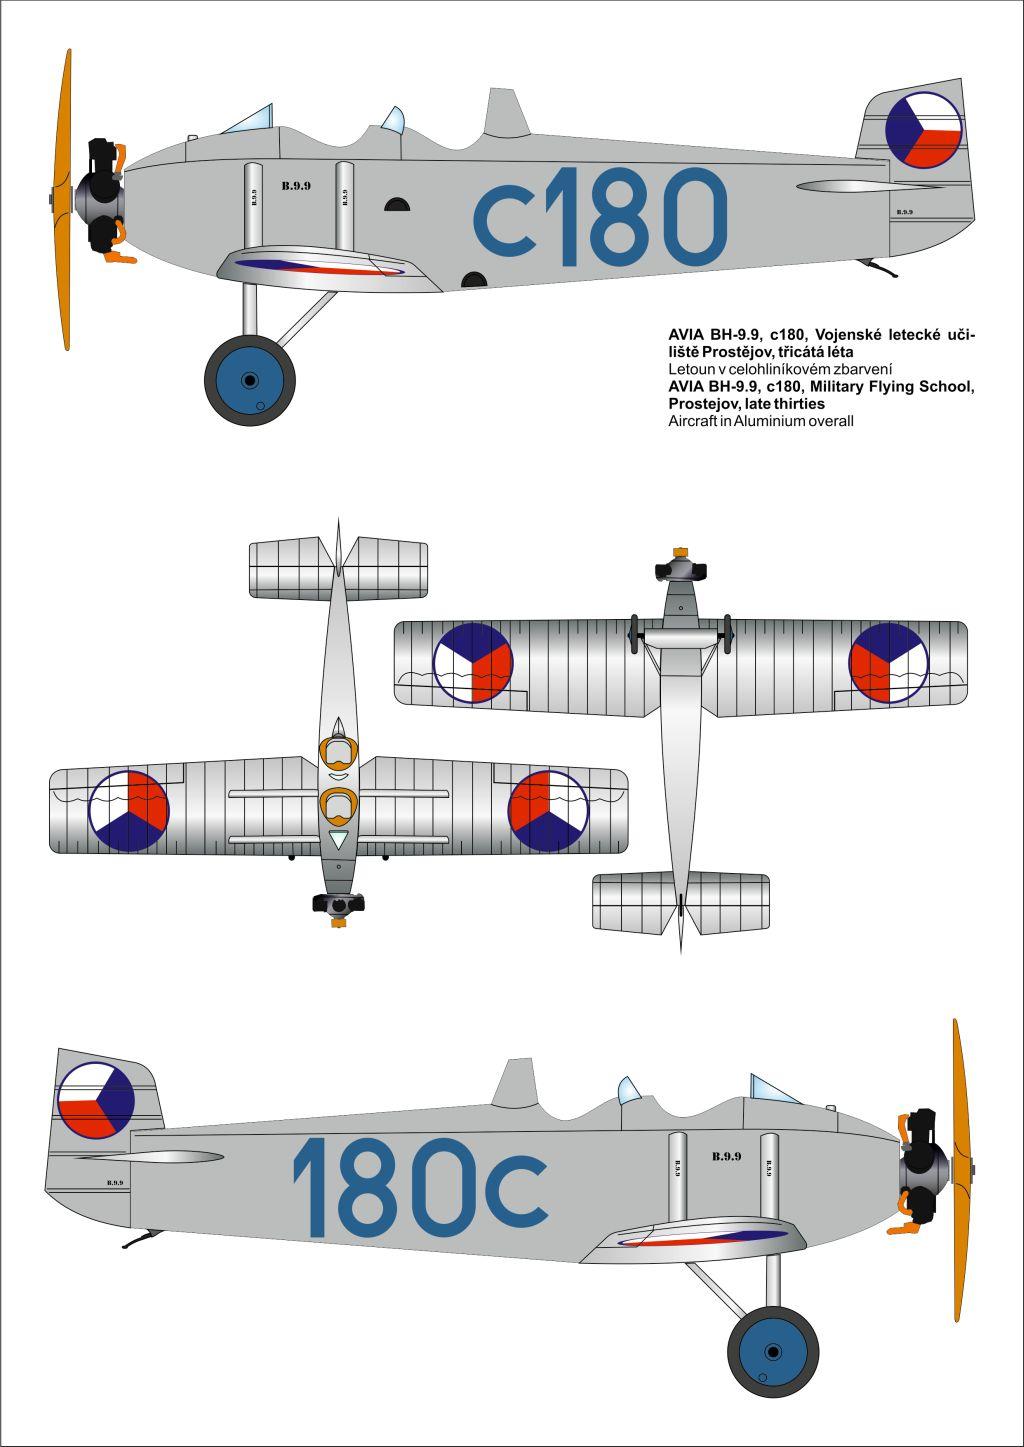 bh-9-4